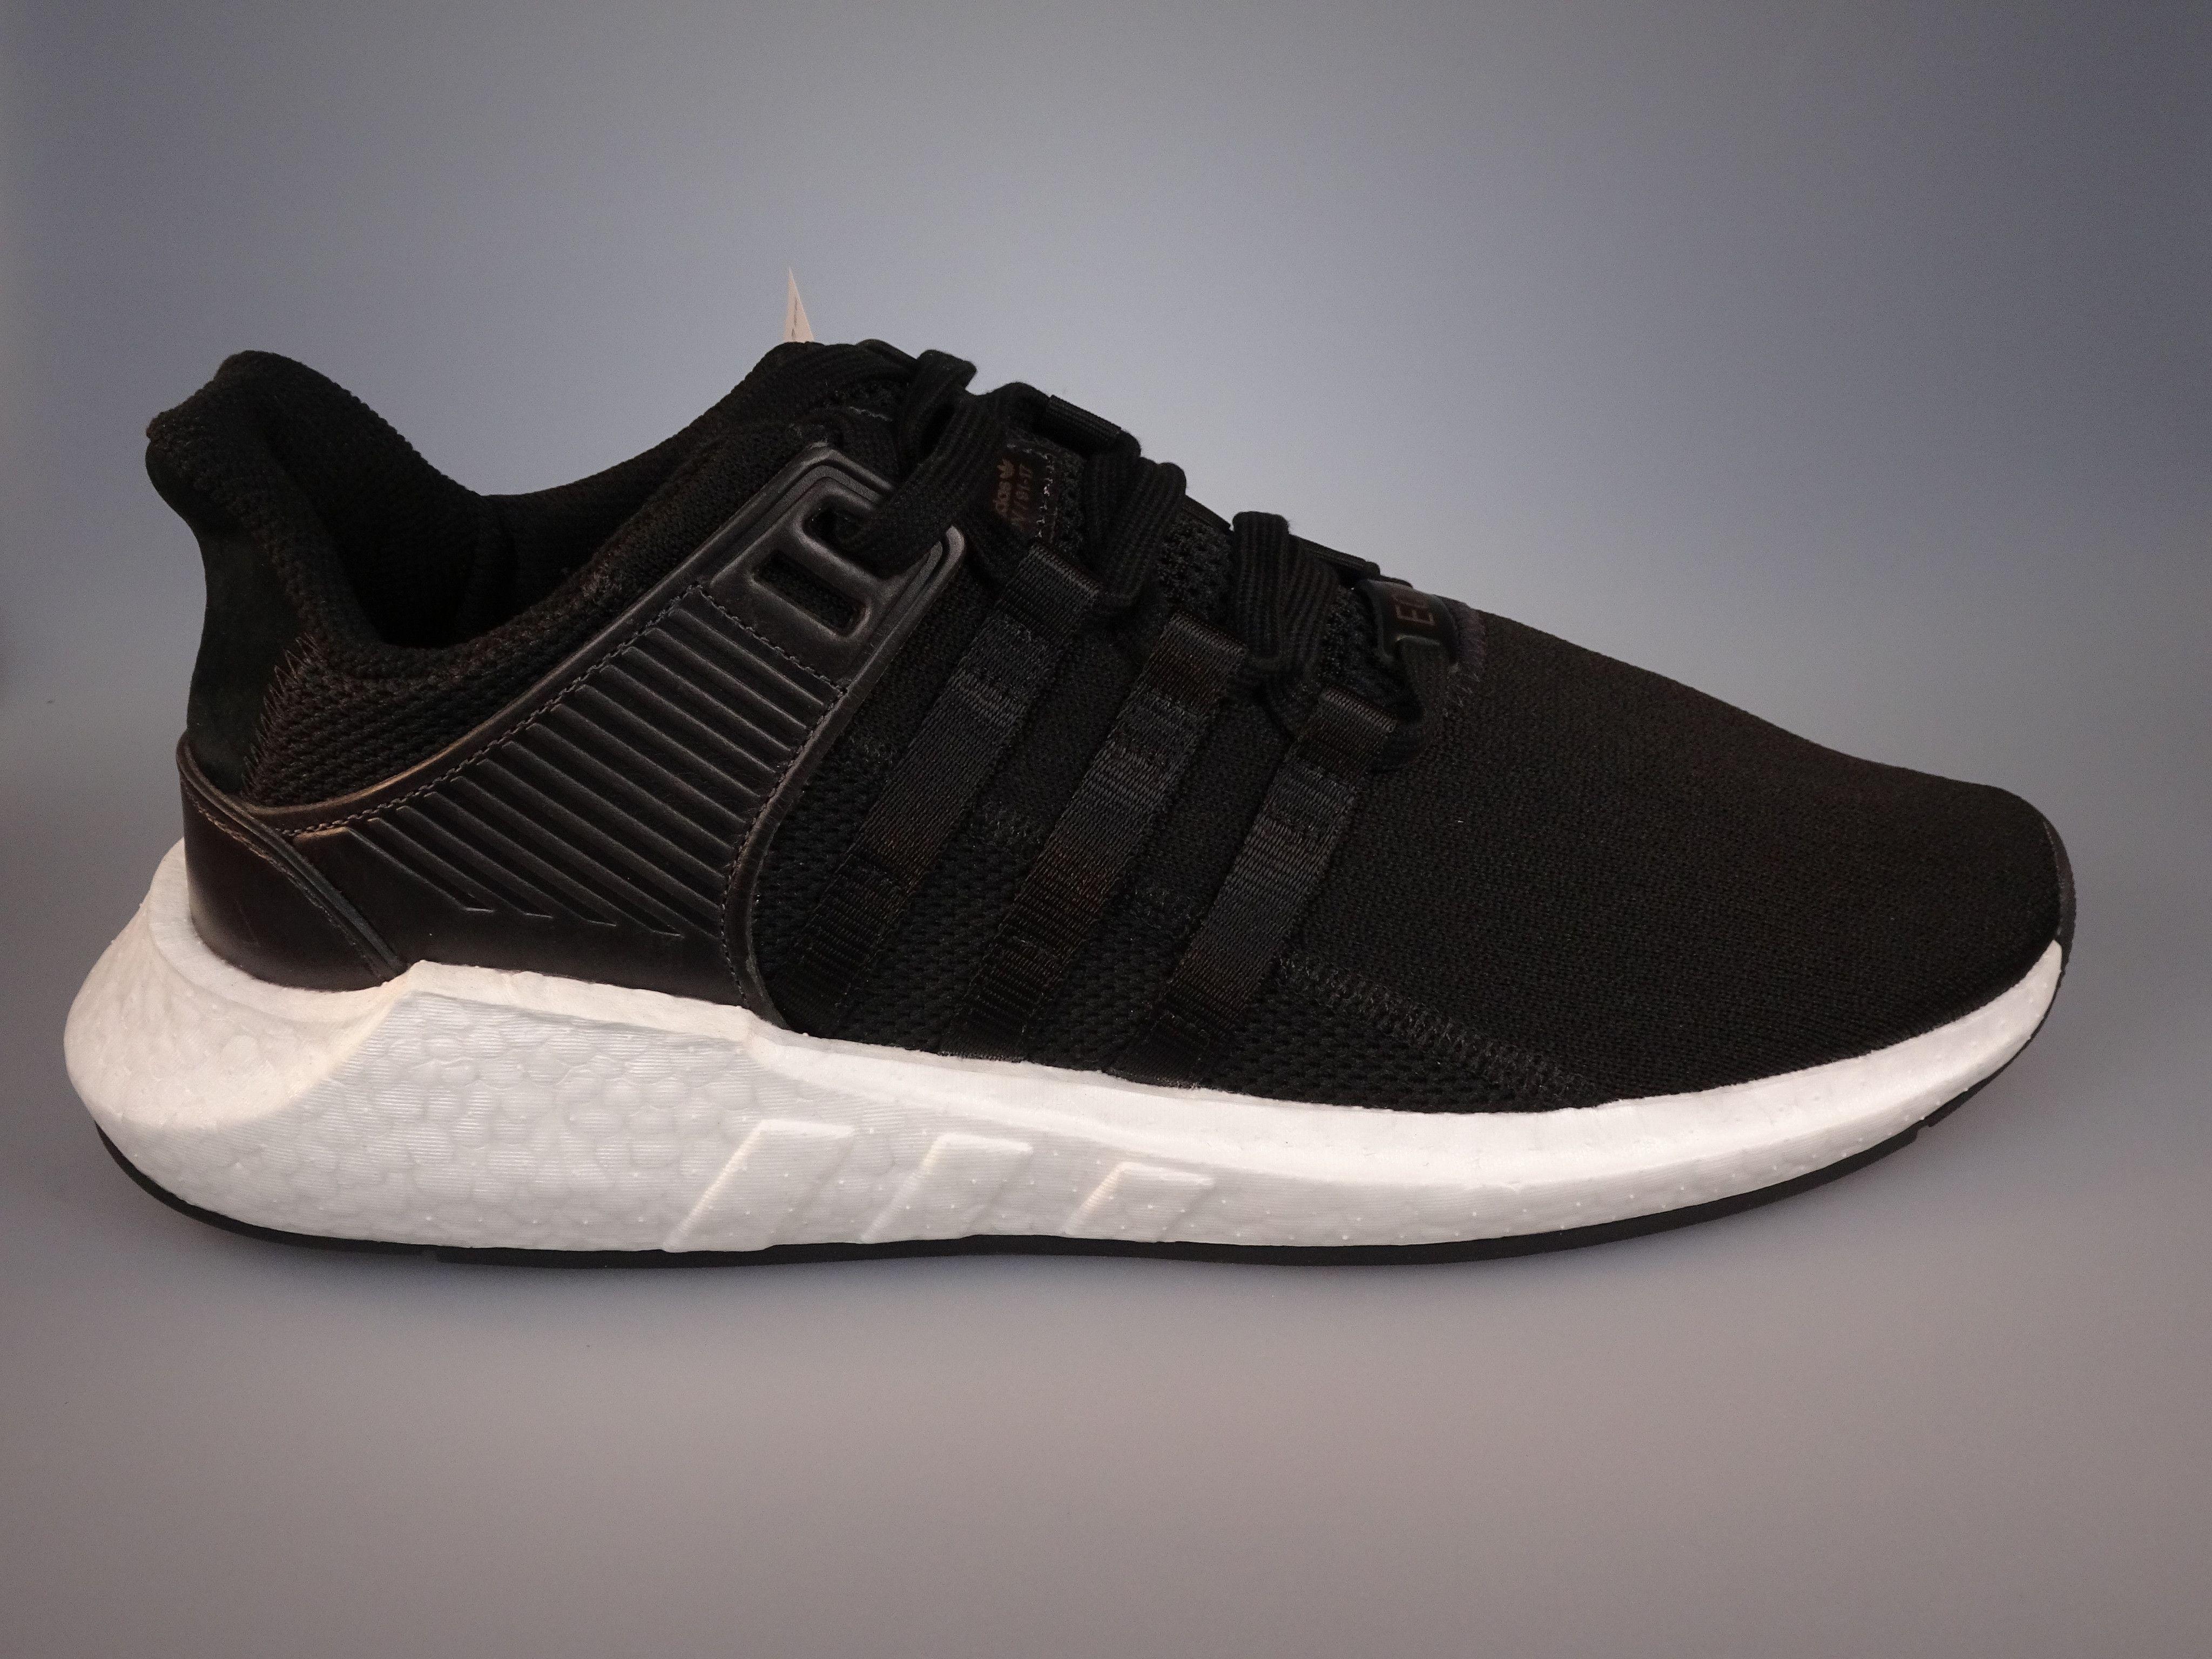 2df14b5ed4ba3 Adidas EQT Support 93 17 Milled Leather Black Size 11.5 (BB1236)  EQT   adidas  adidaseqt  BB1236